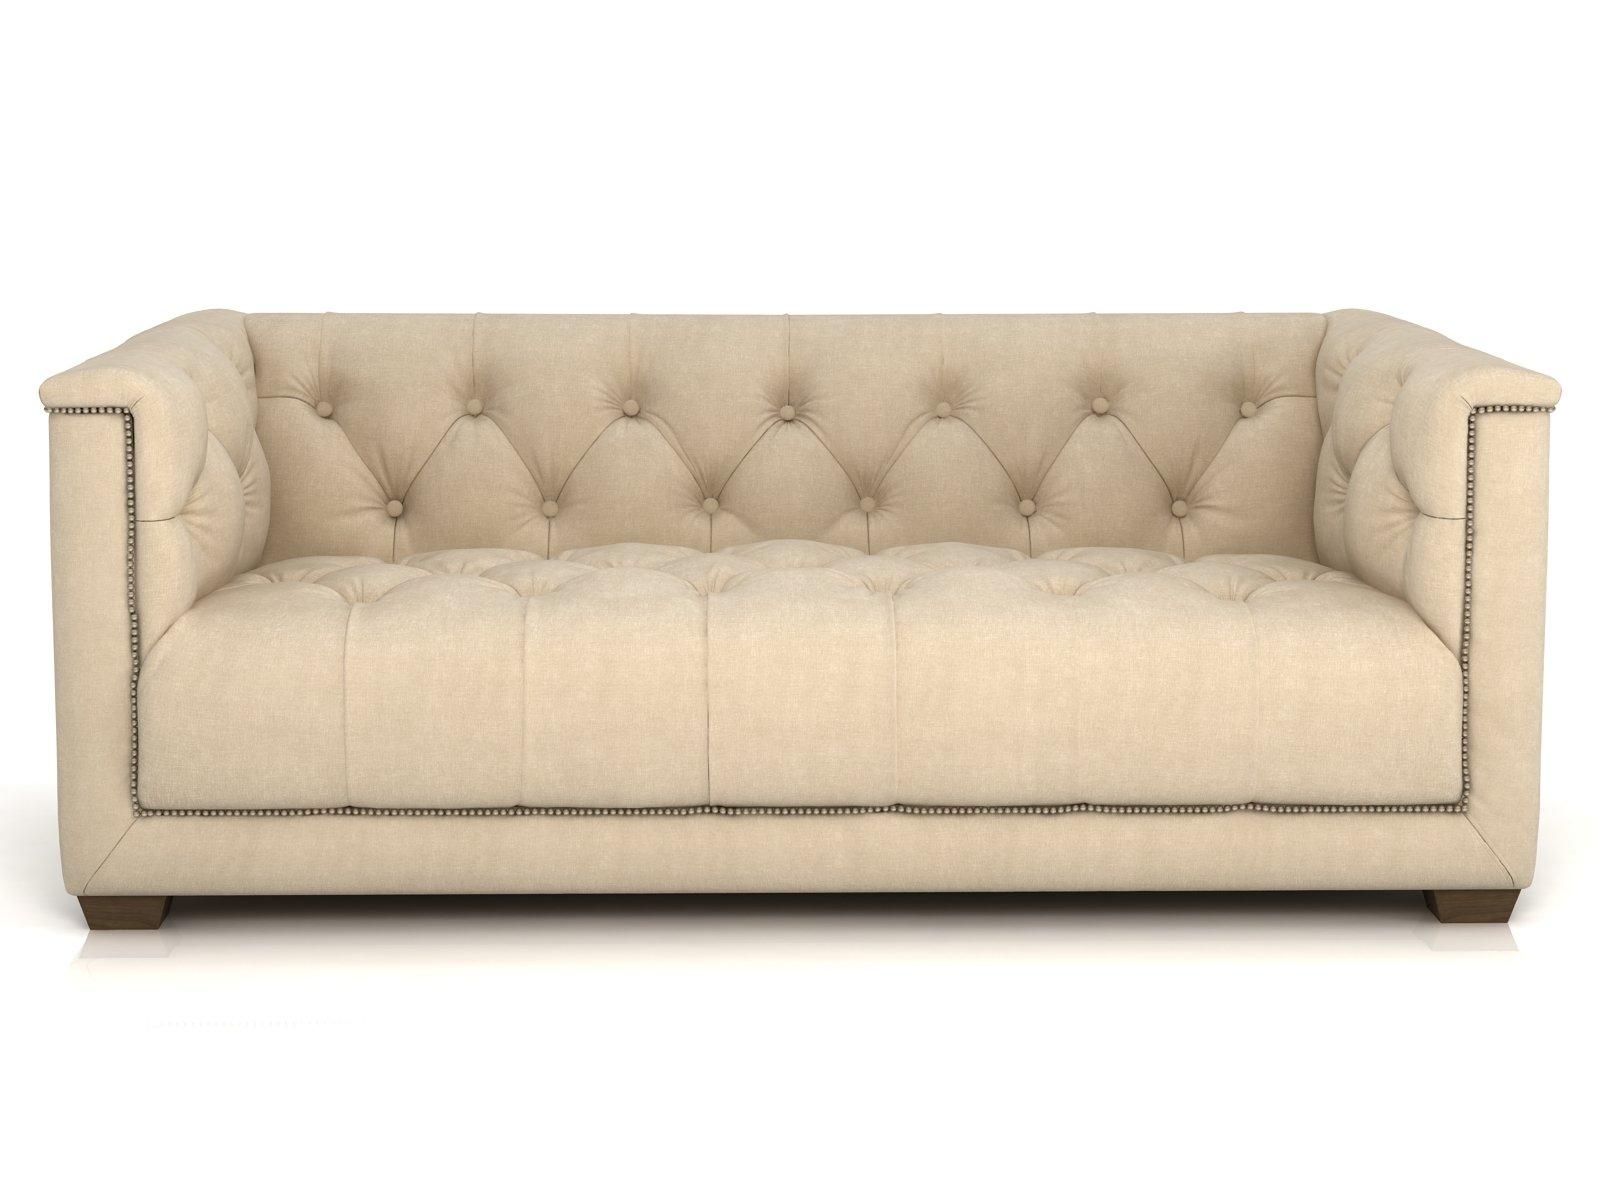 savoy leather sofa restoration hardware poltrona frau review 6 39 3d model